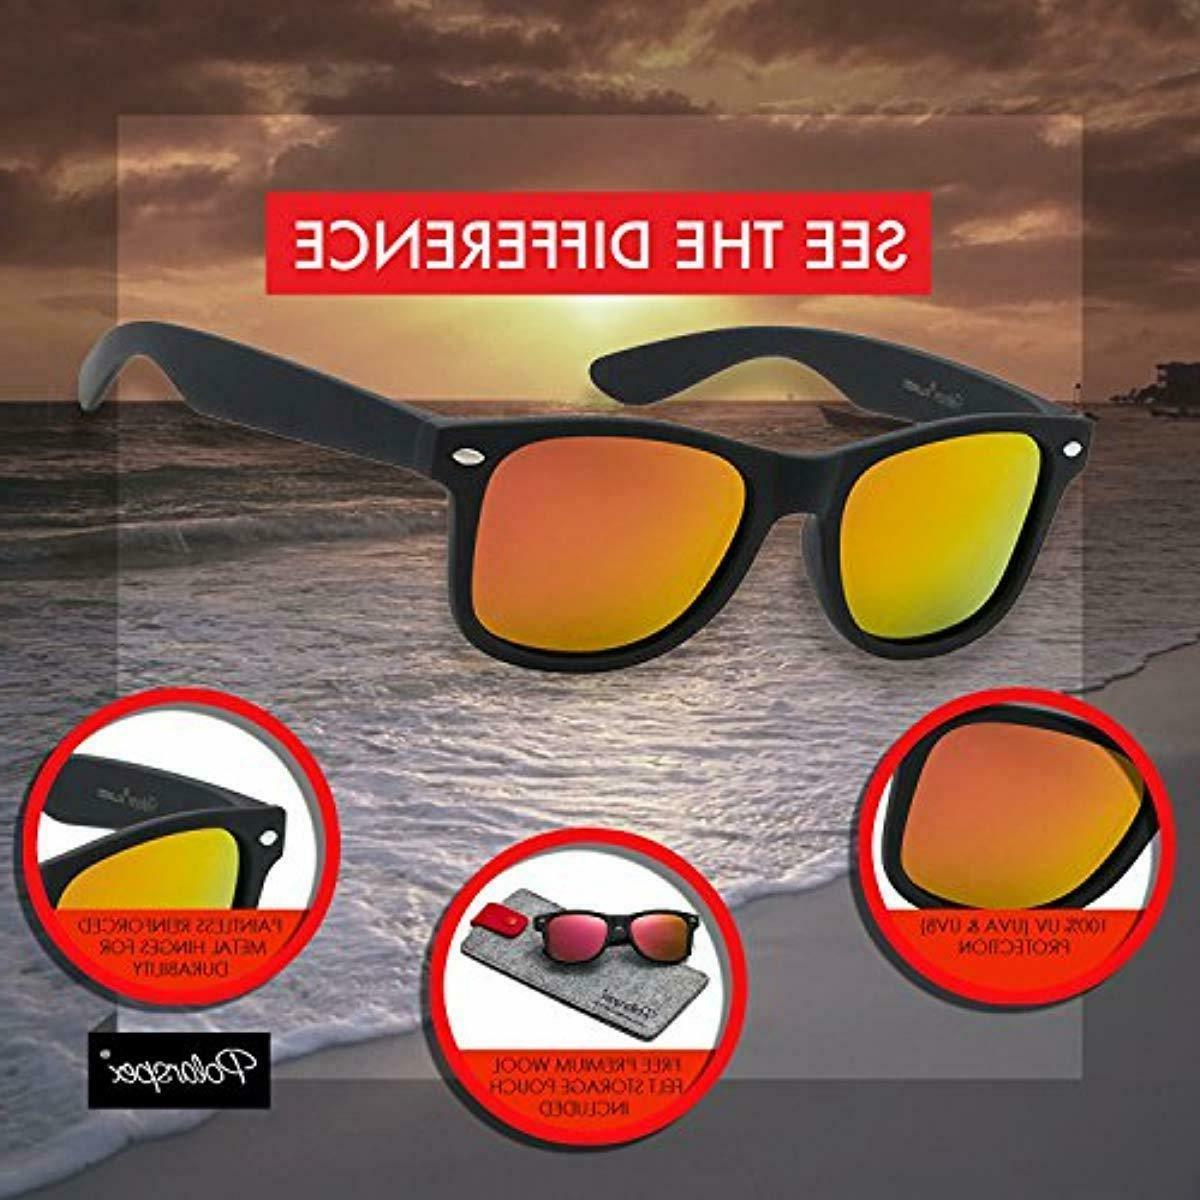 Retro Trendy Sunglasses for Men